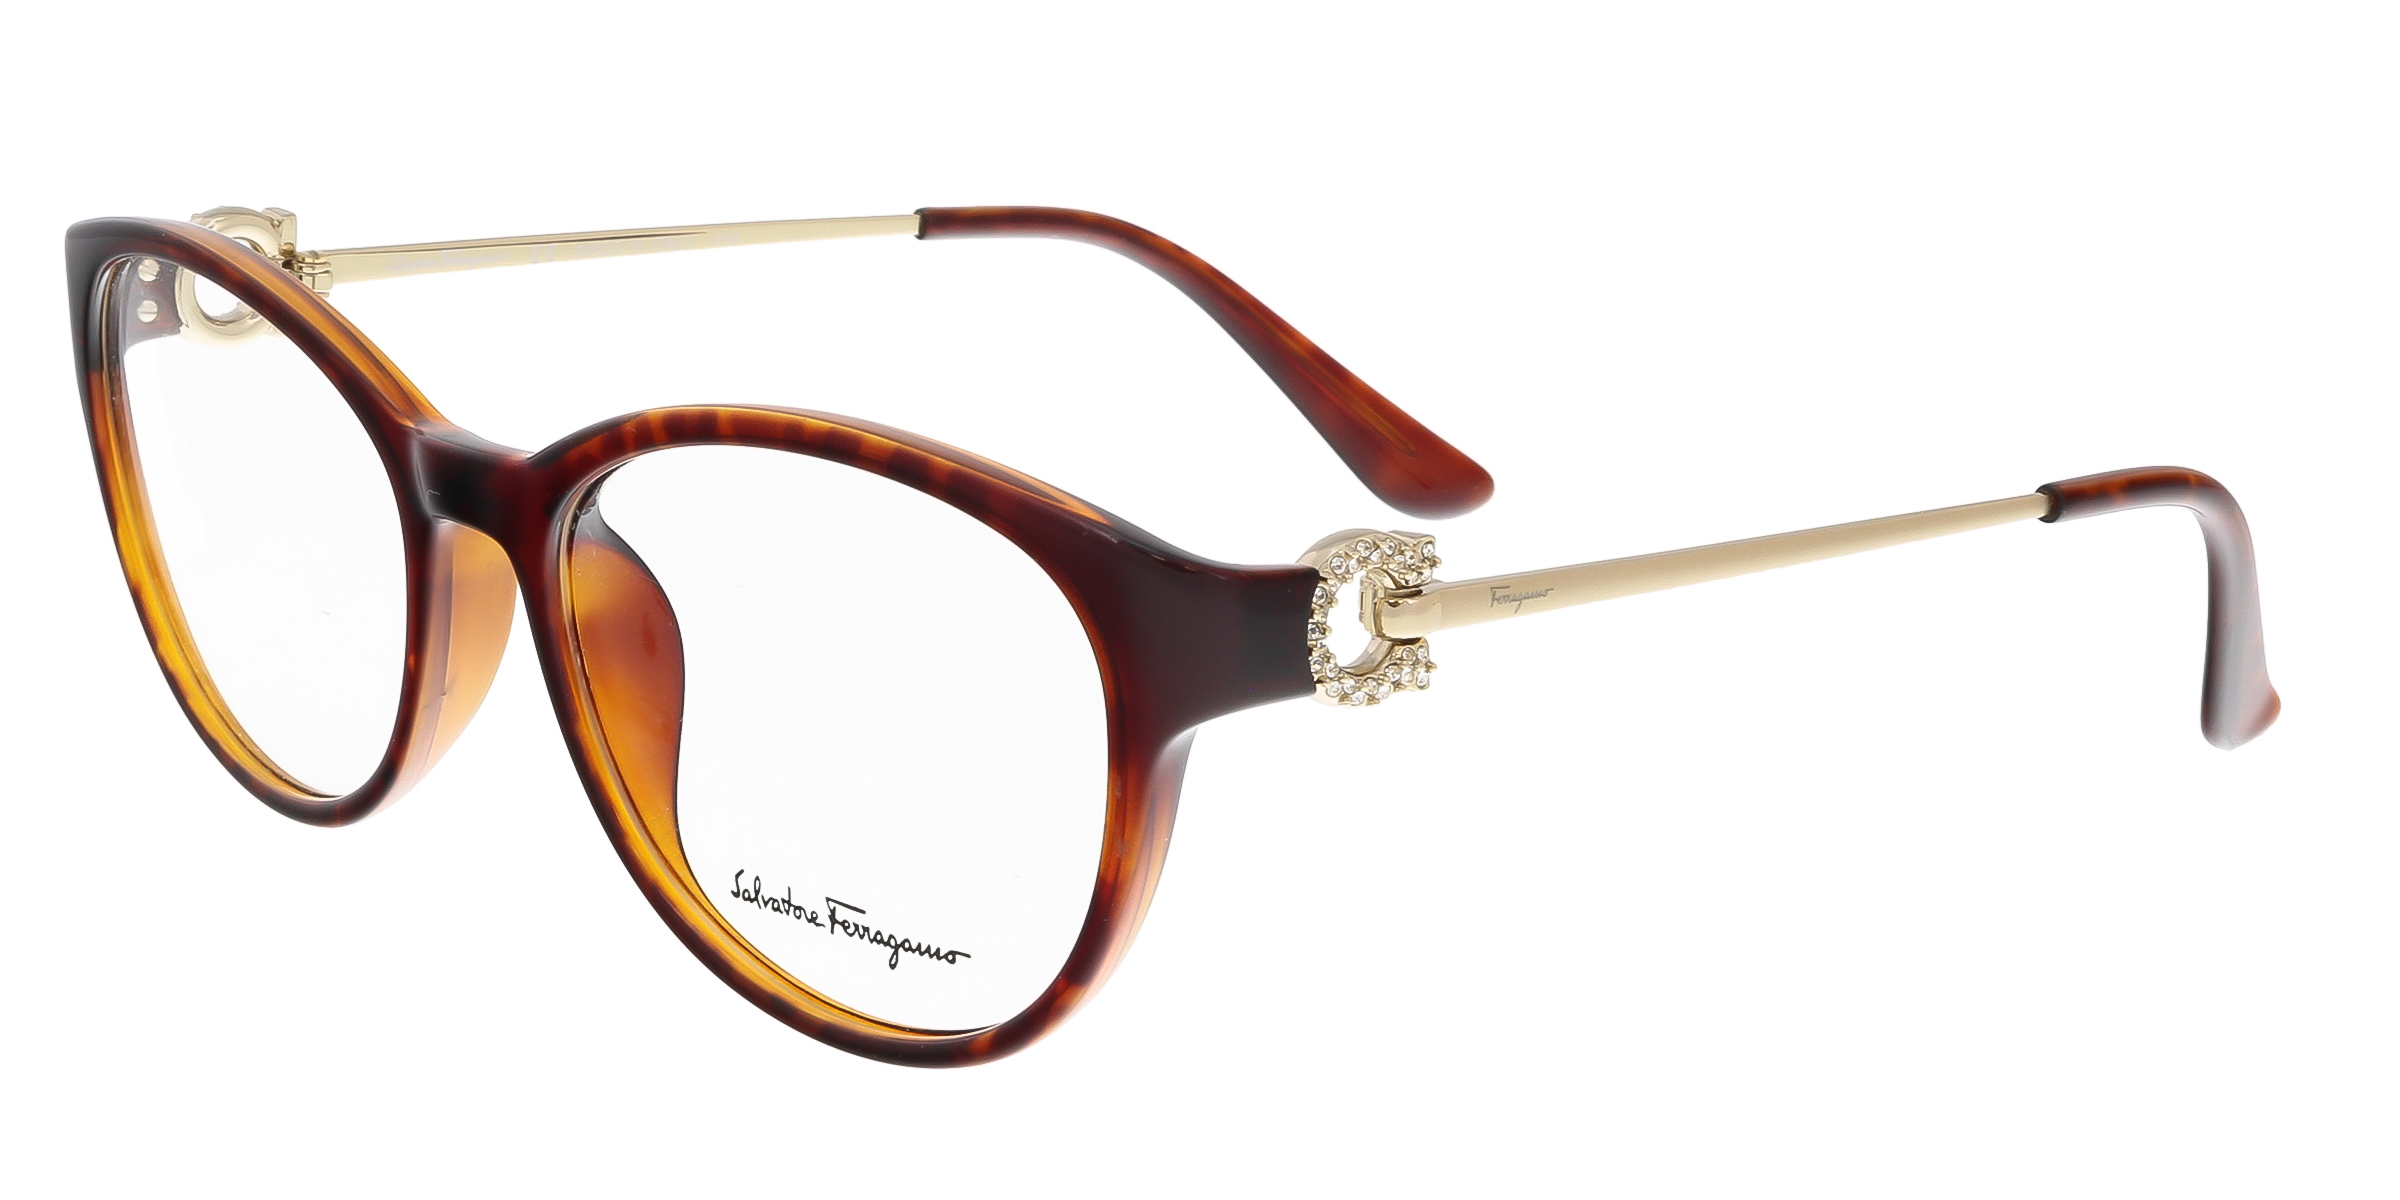 Salvatore Ferragamo SF2704/R 214 Tortoise Cateye Optical Frames